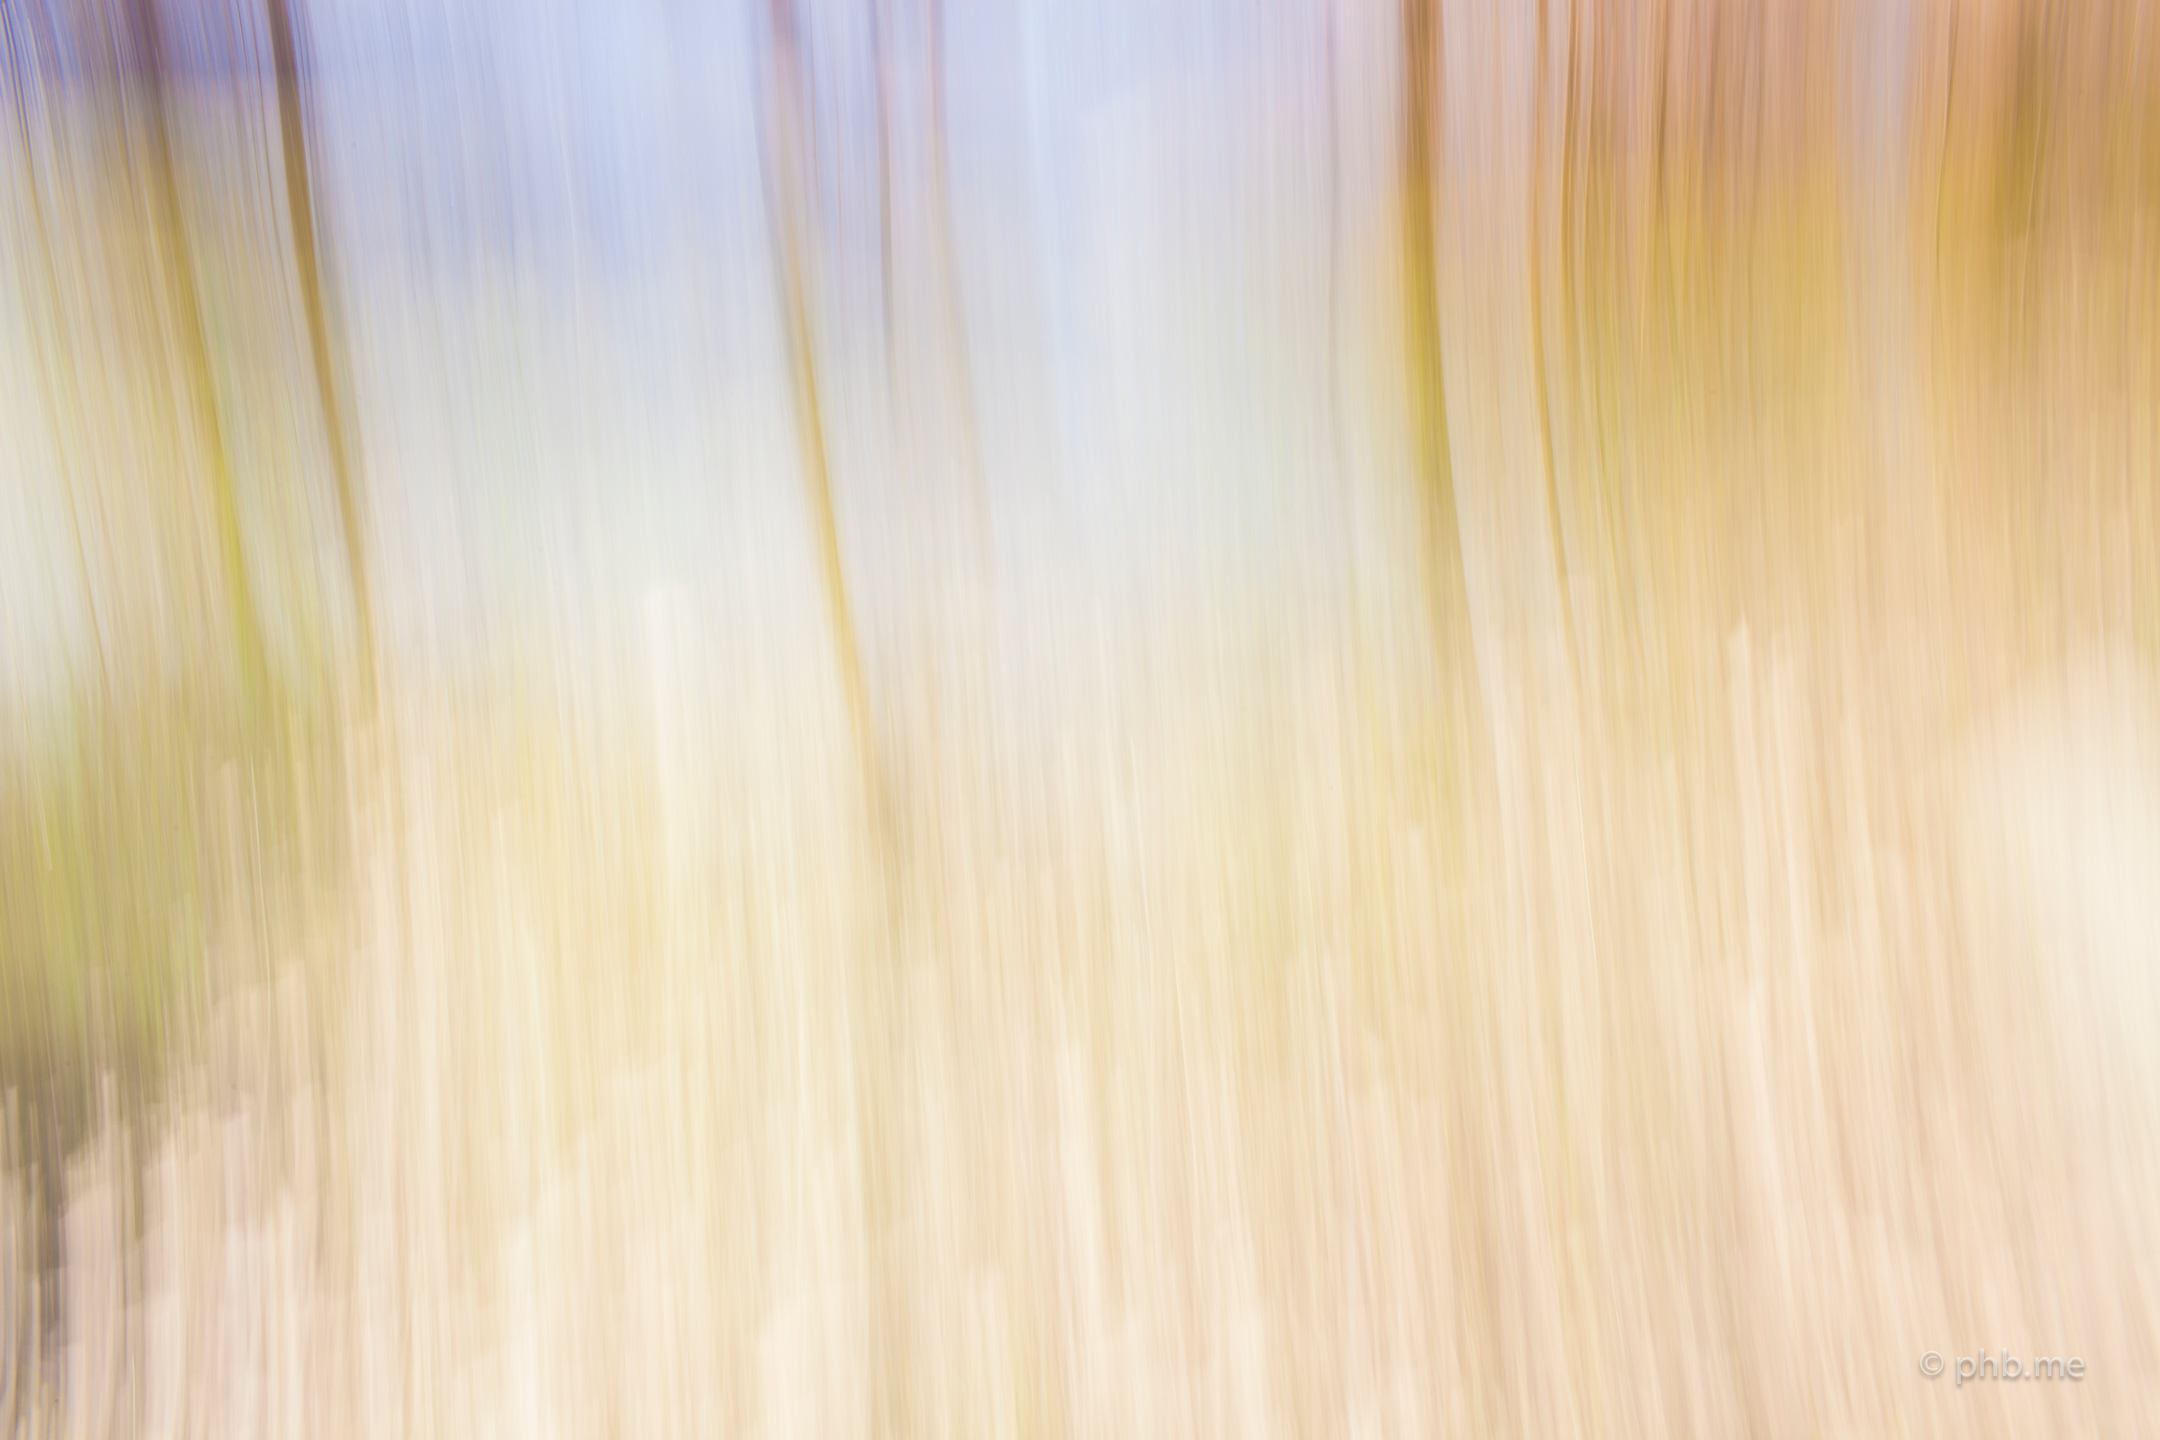 phb-me-nb-huchot-2014-painting-photo-img_0623-4-sur-berges-tarn